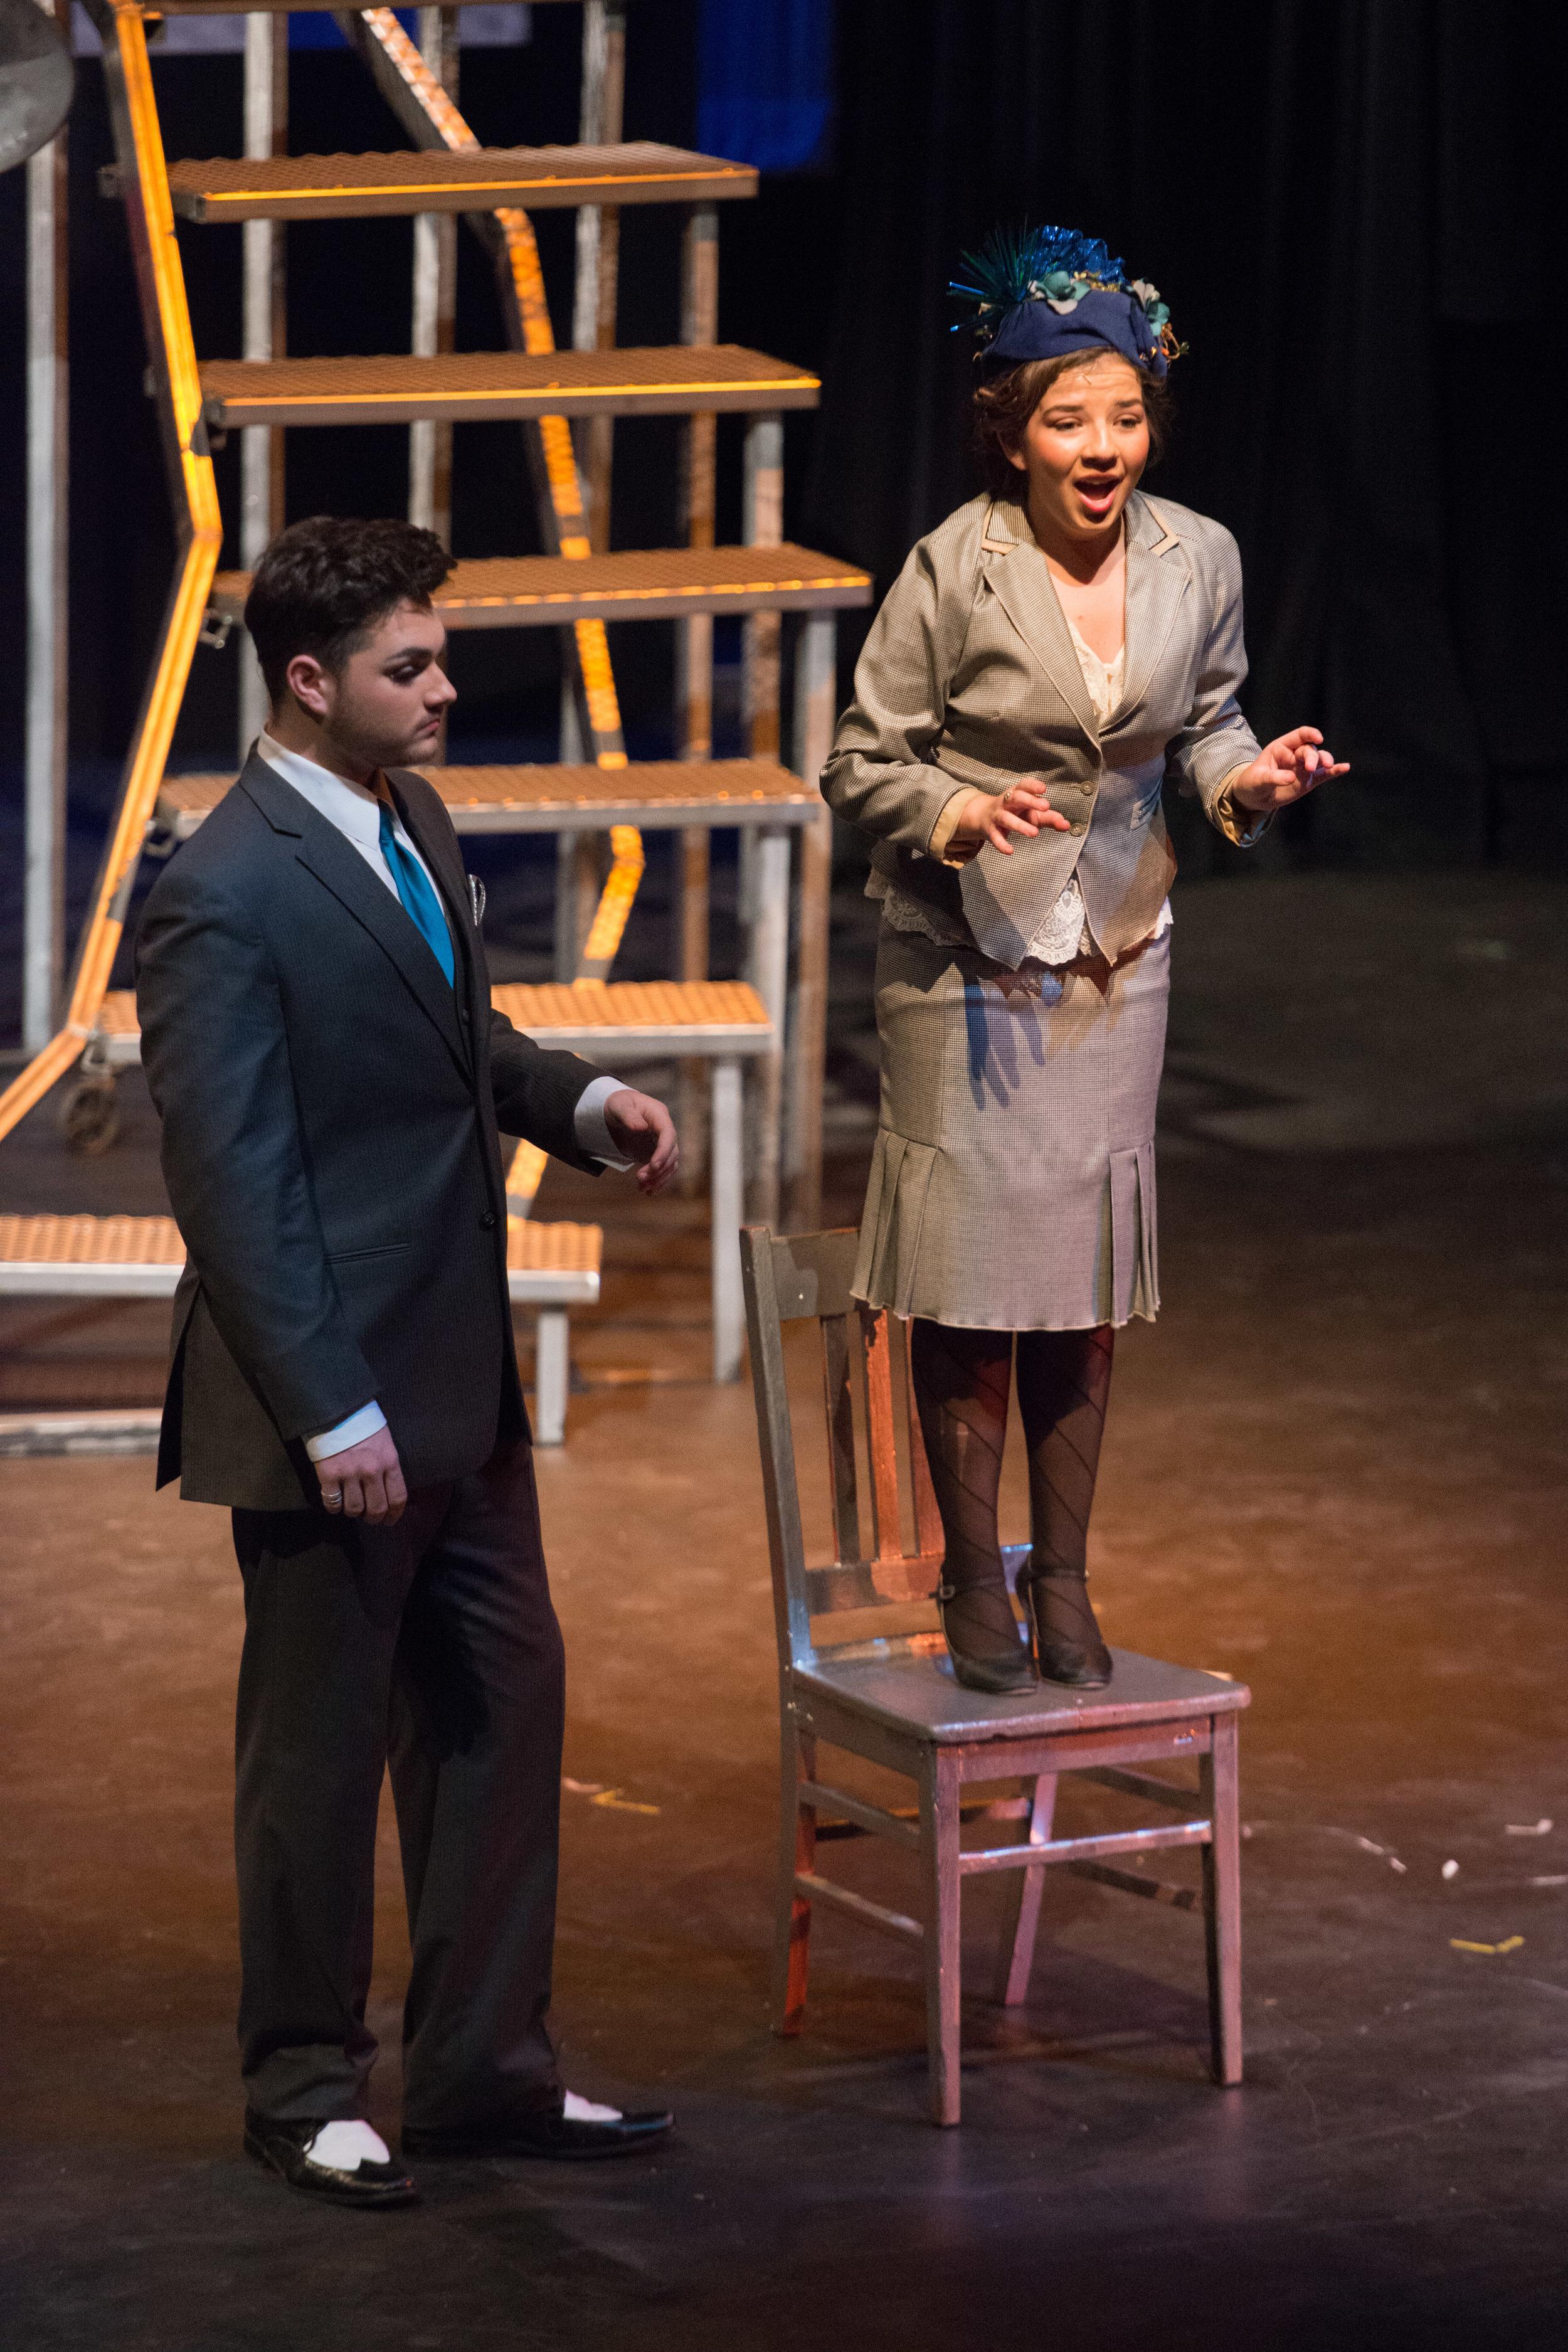 Chicago at Santa Barbara High School Theatre. Photo Courtesy of Kristi Sestak